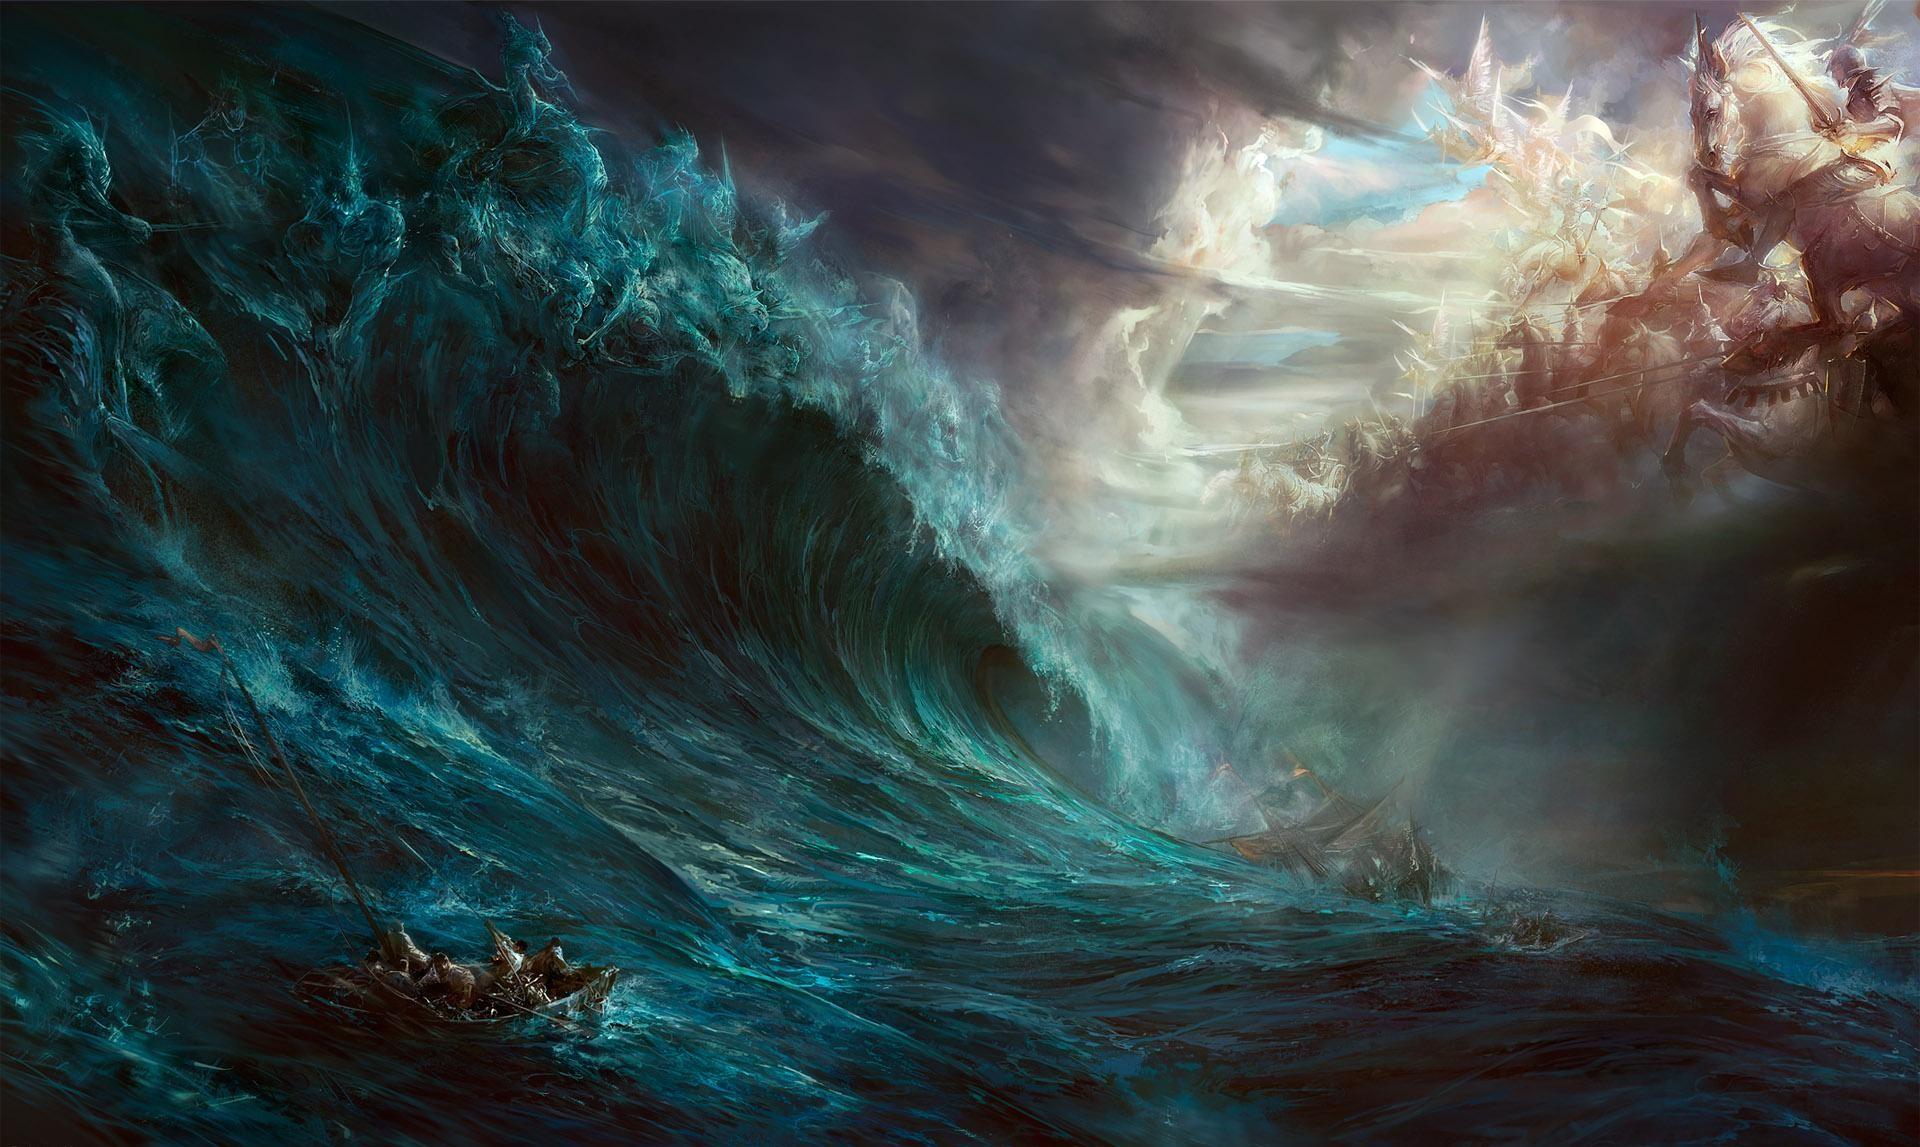 Wallpaper Boat Fantasy Art Sea Storm Heaven Hell